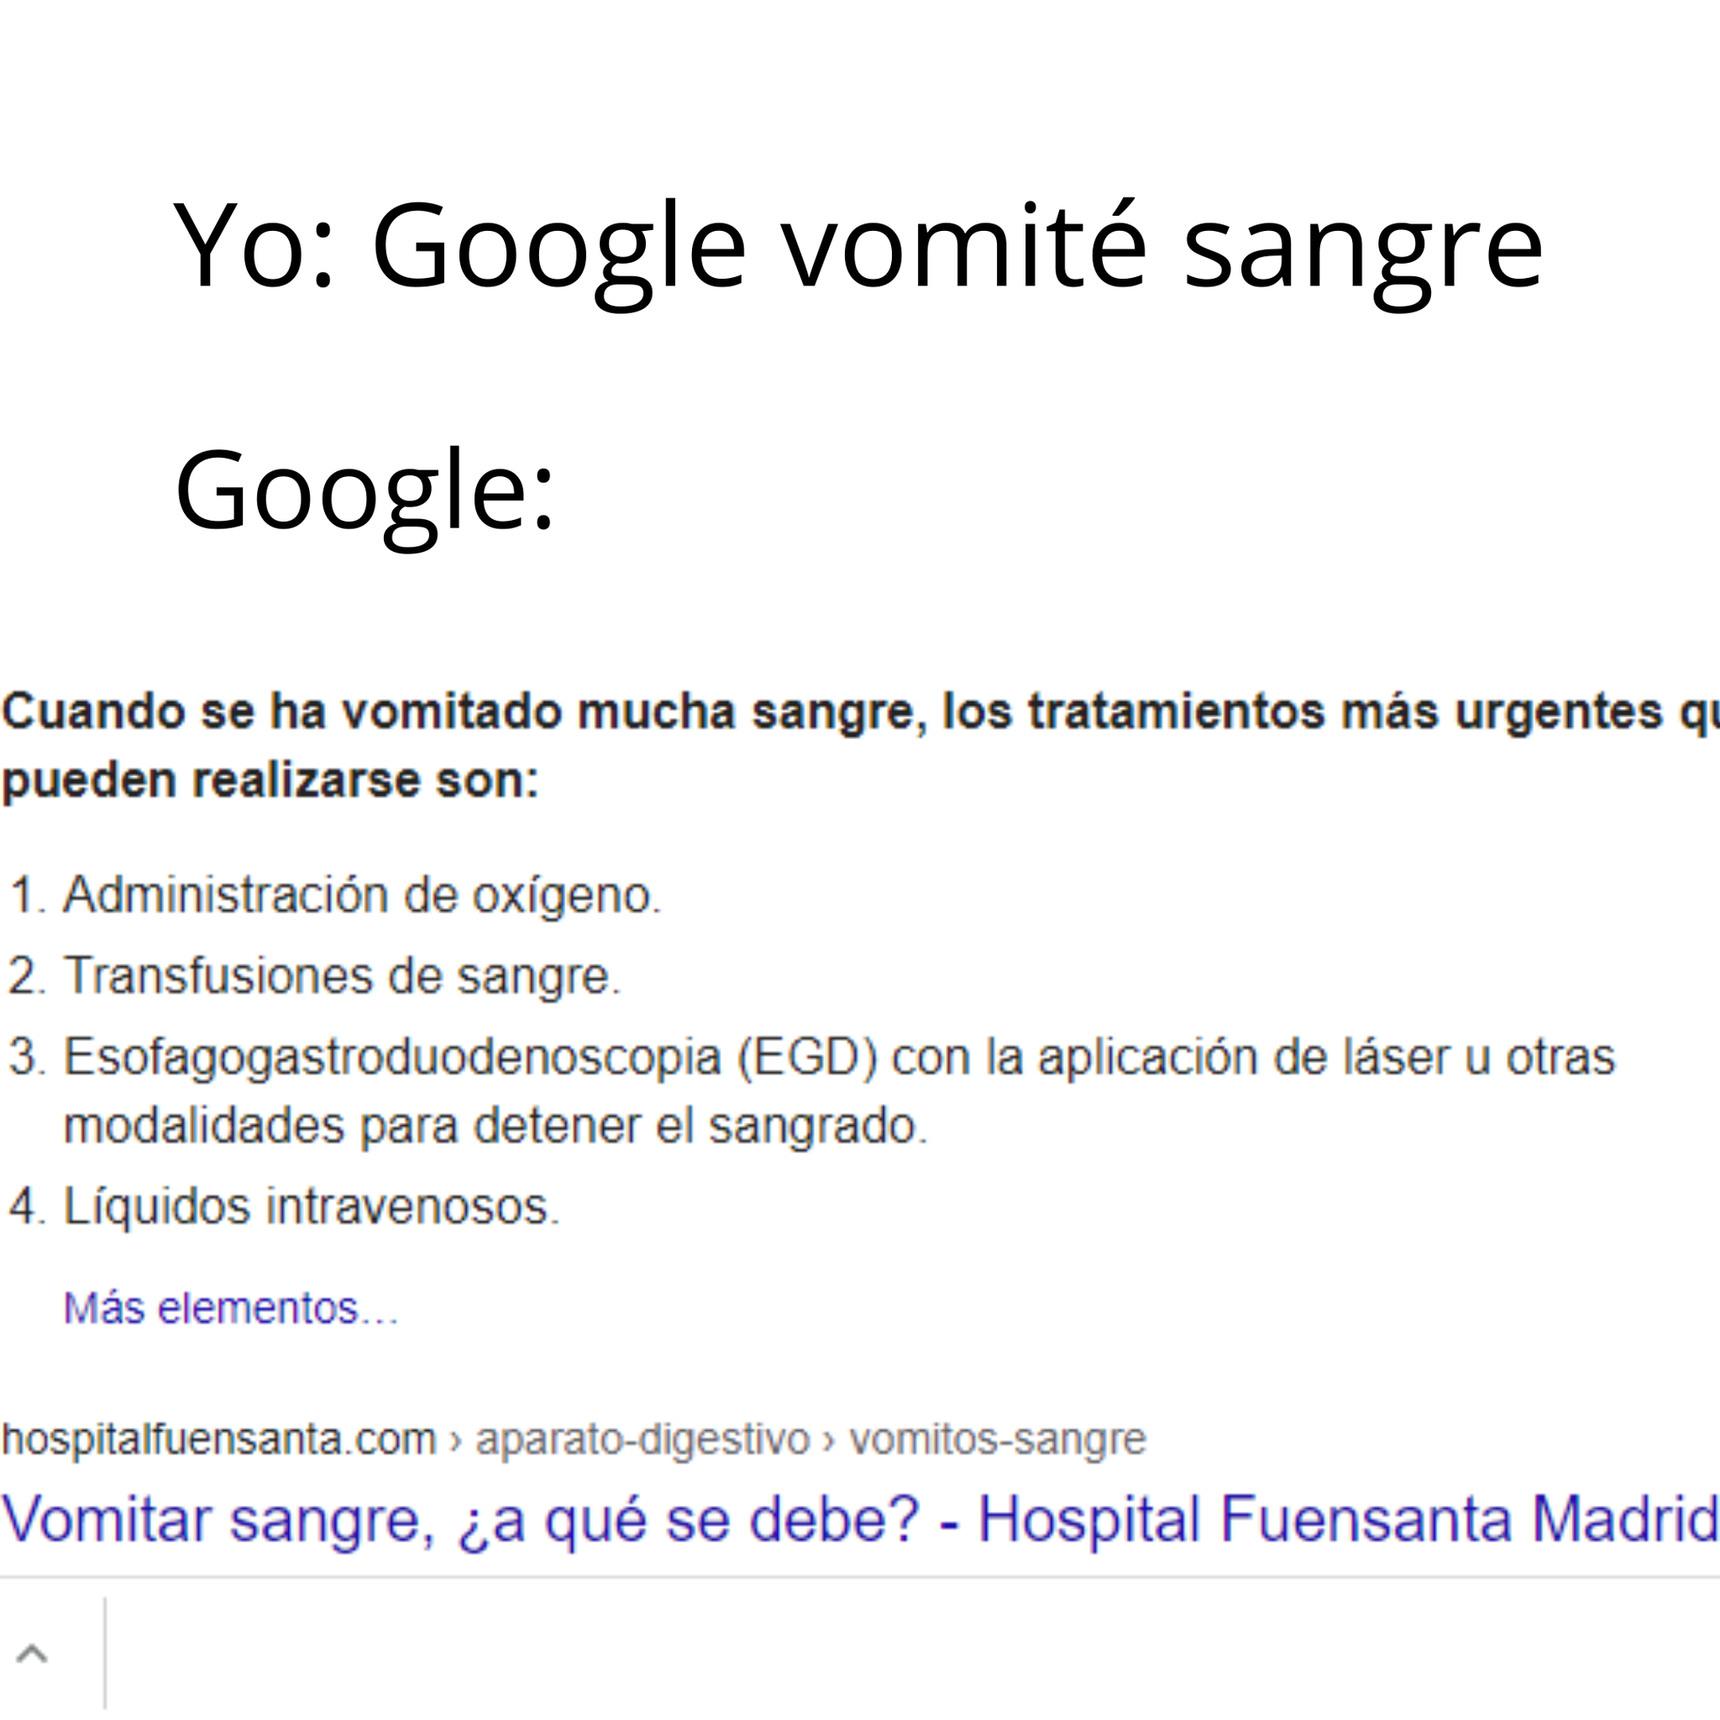 La medicina de Google es la mejor :) - meme